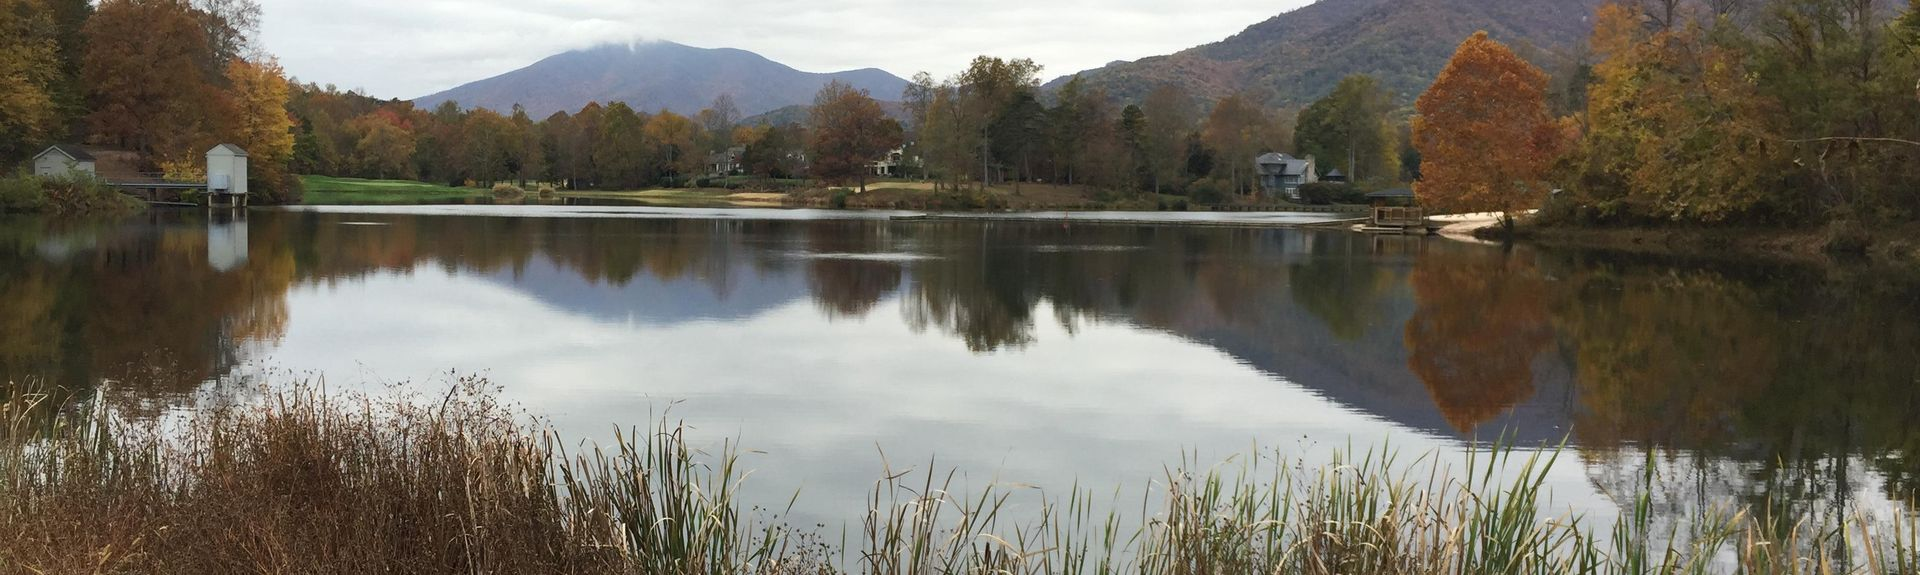 Raven's Roost Overlook, Lyndhurst, Virginia, United States of America